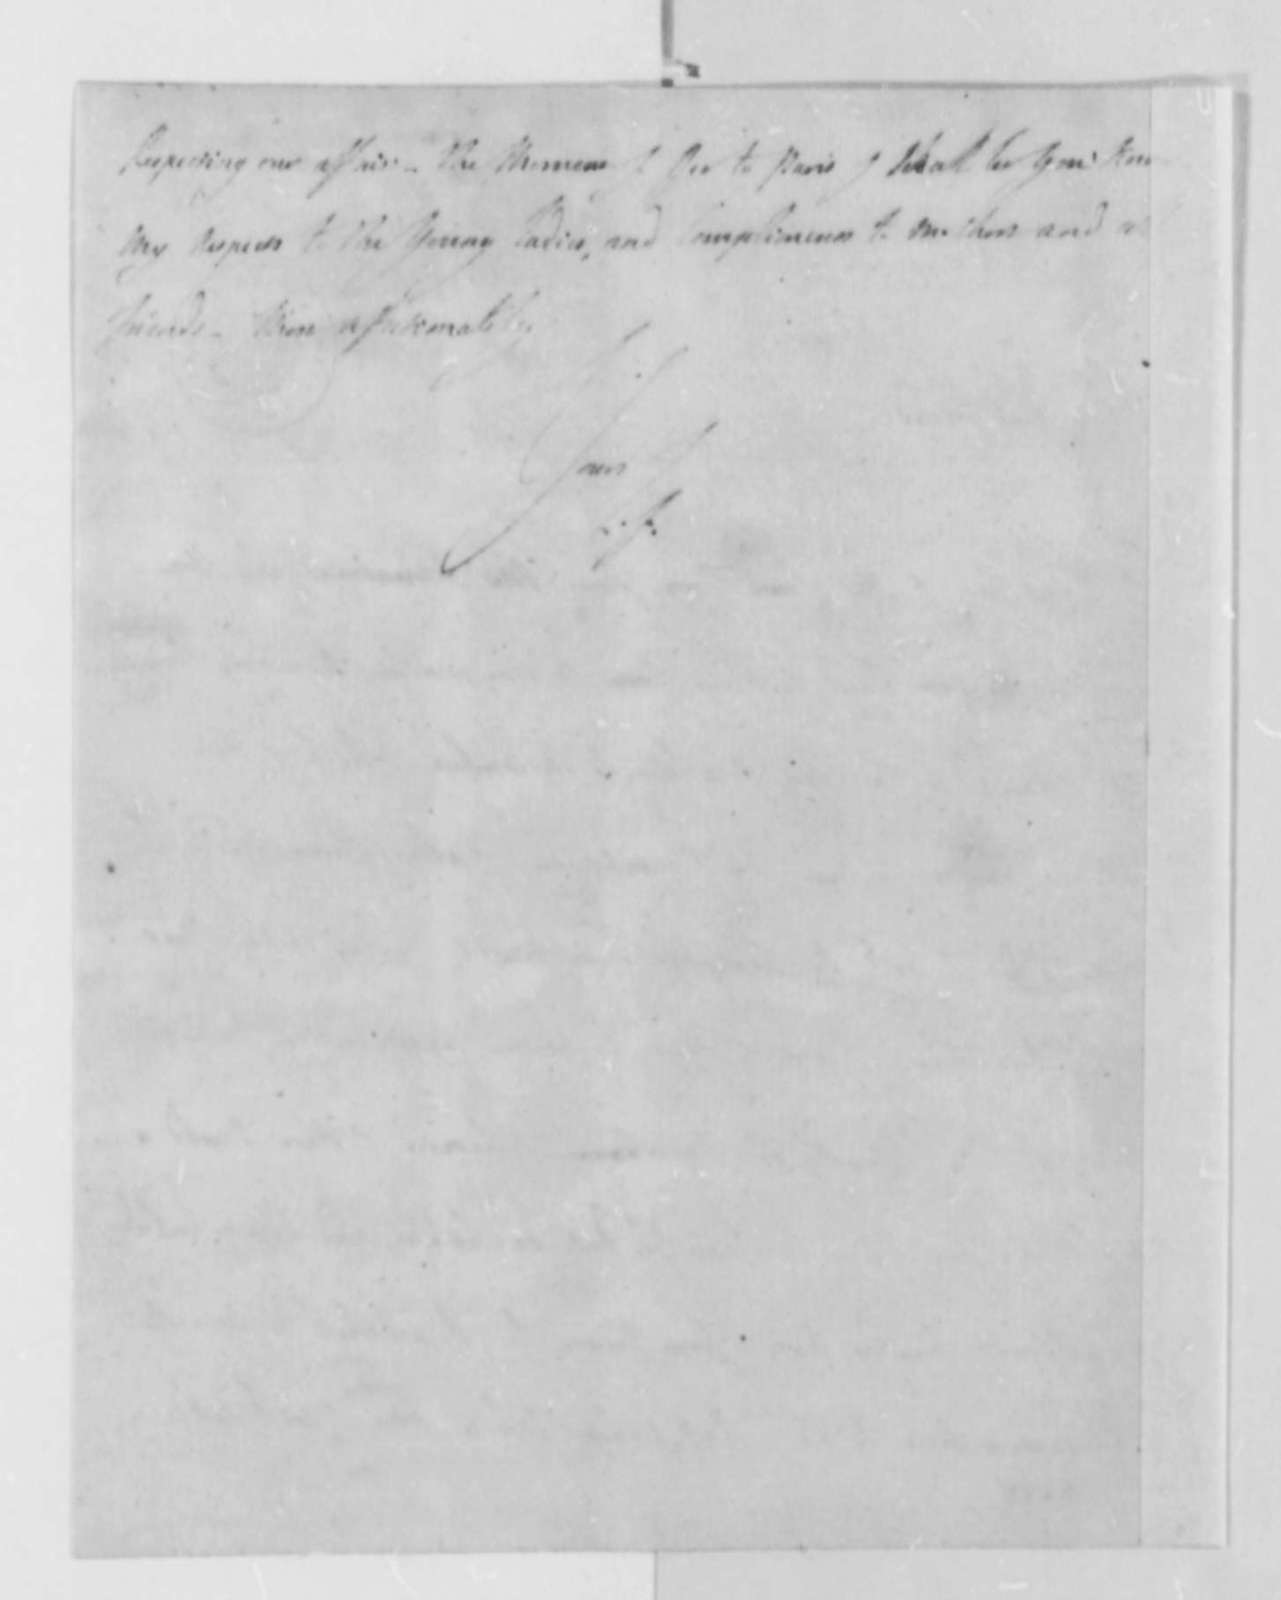 Marie Joseph Paul Yves Roch Gilbert du Motier, Marquis de Lafayette to Thomas Jefferson, September 18, 1787